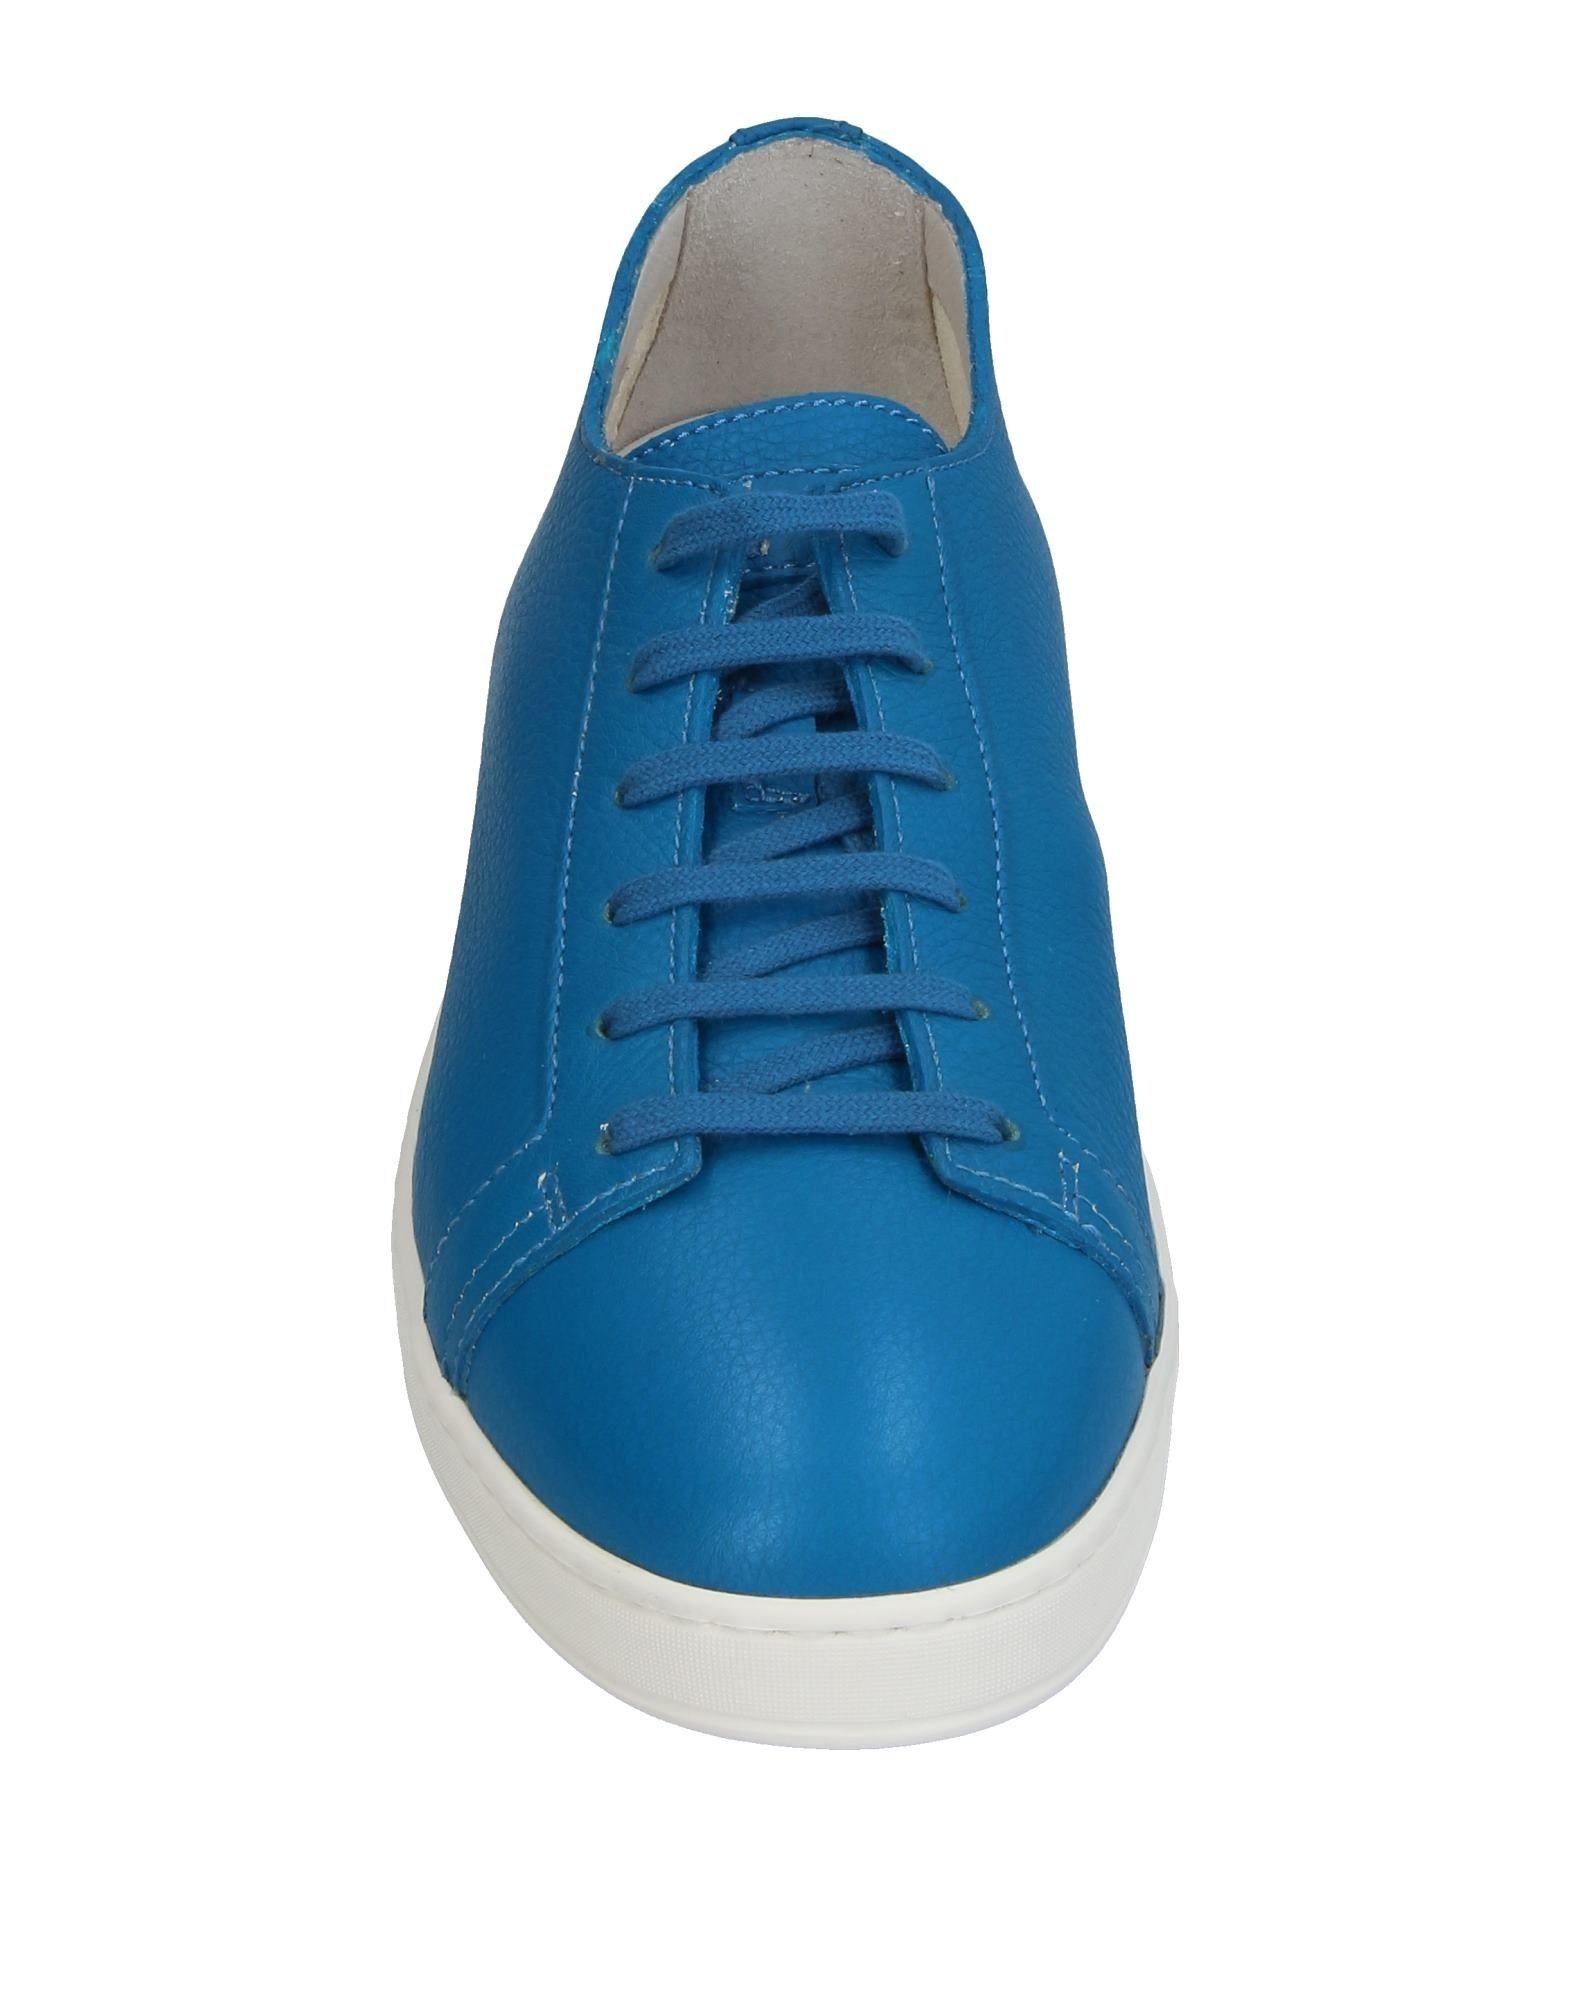 Santoni Sneakers - Men Santoni Sneakers online on on on  Canada - 11409670EO 08c0cc